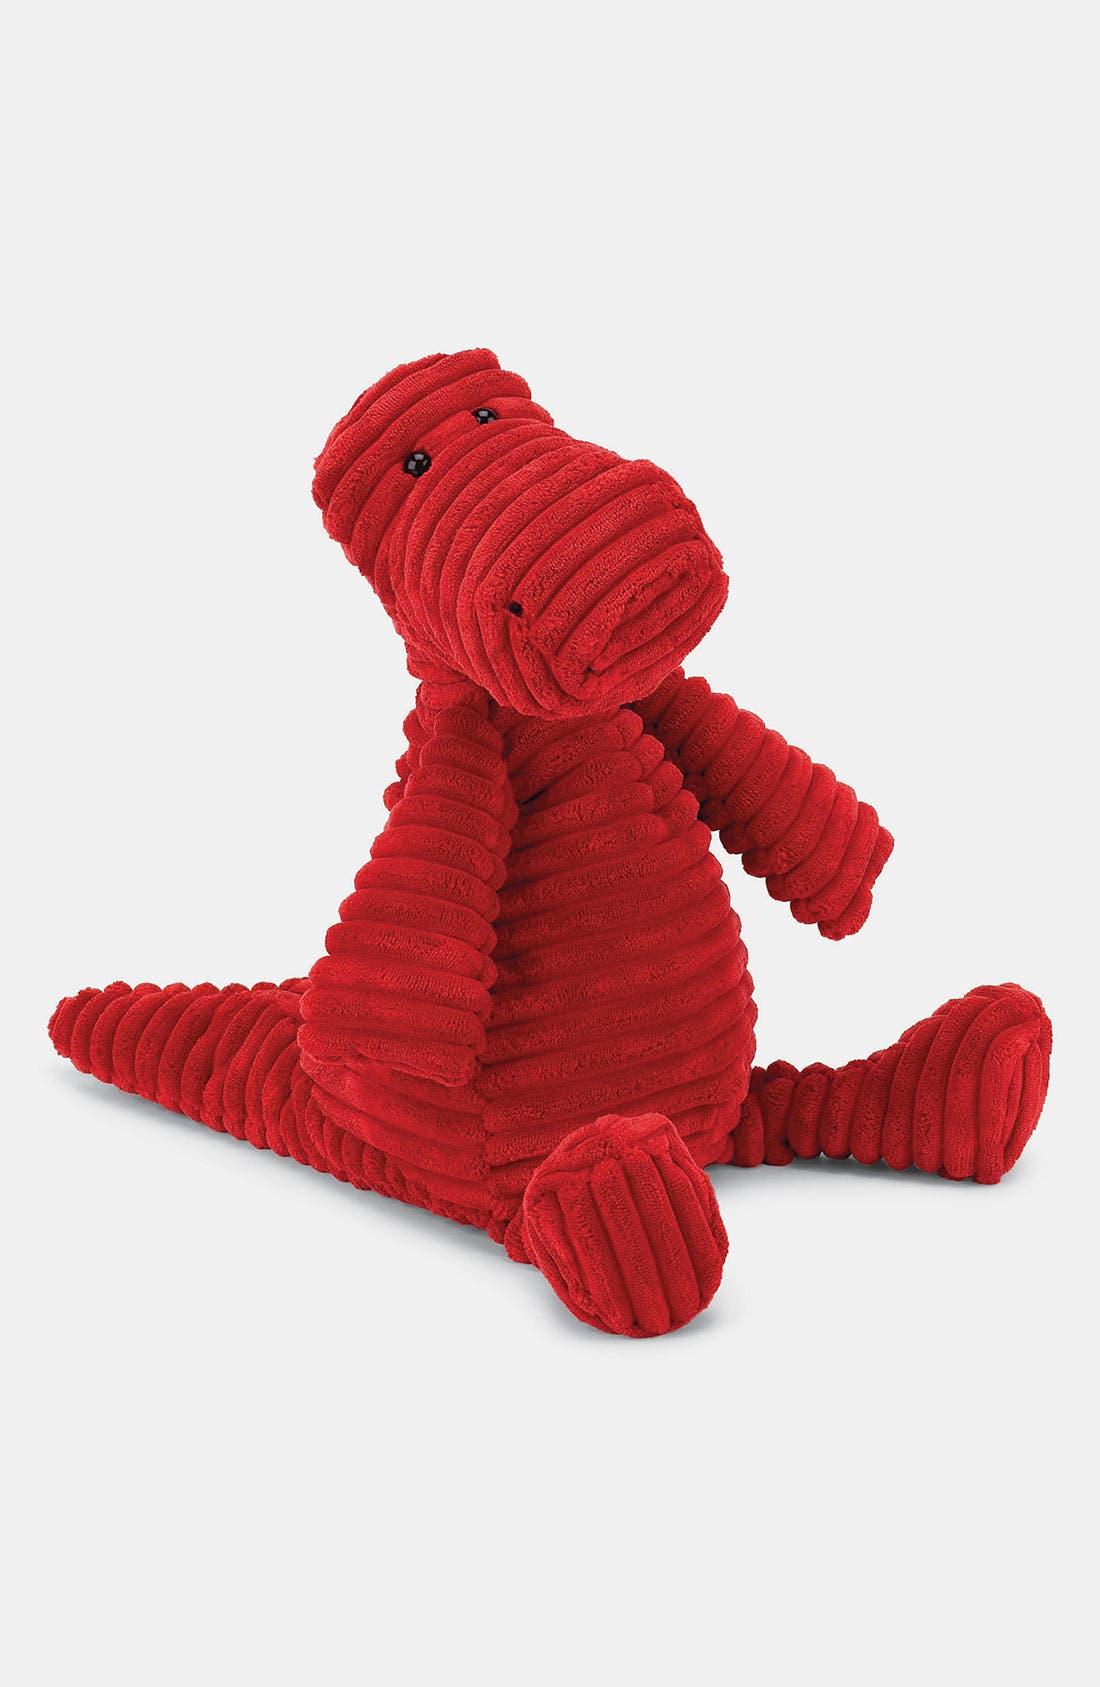 Main Image - Jellycat 'Cordy Roy' Dinosaur Stuffed Animal